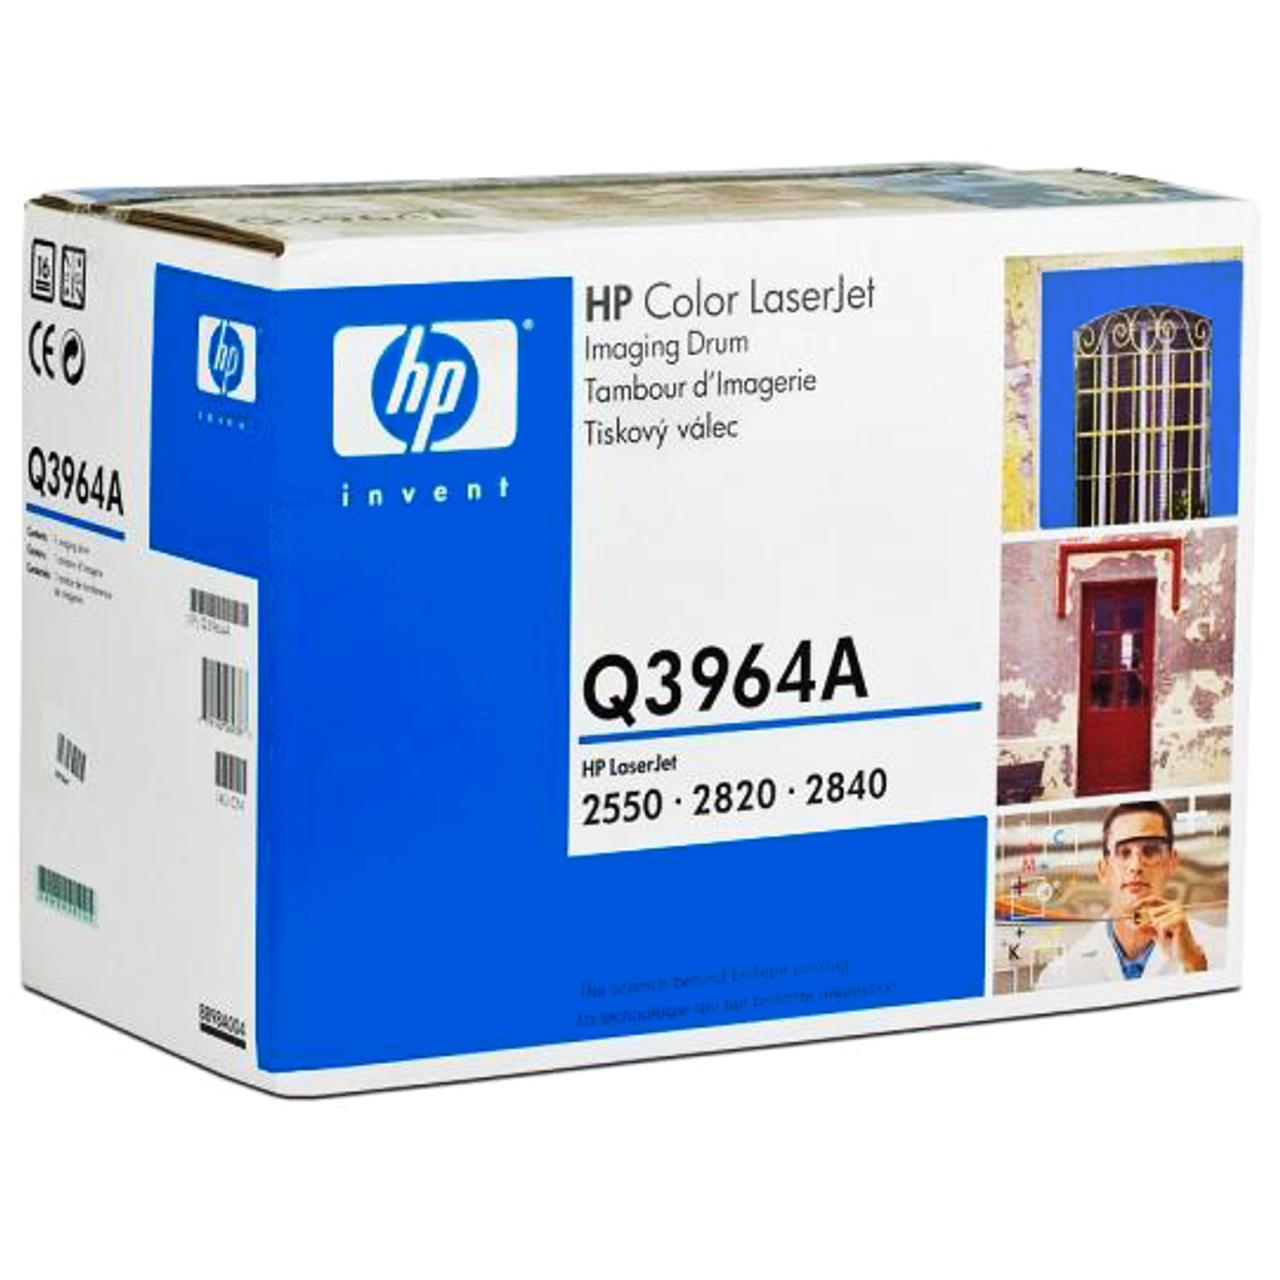 Set 4 Genuine HP 4600  641A Toner Cartridges  B//C//M//Y  New Sealed Boxes